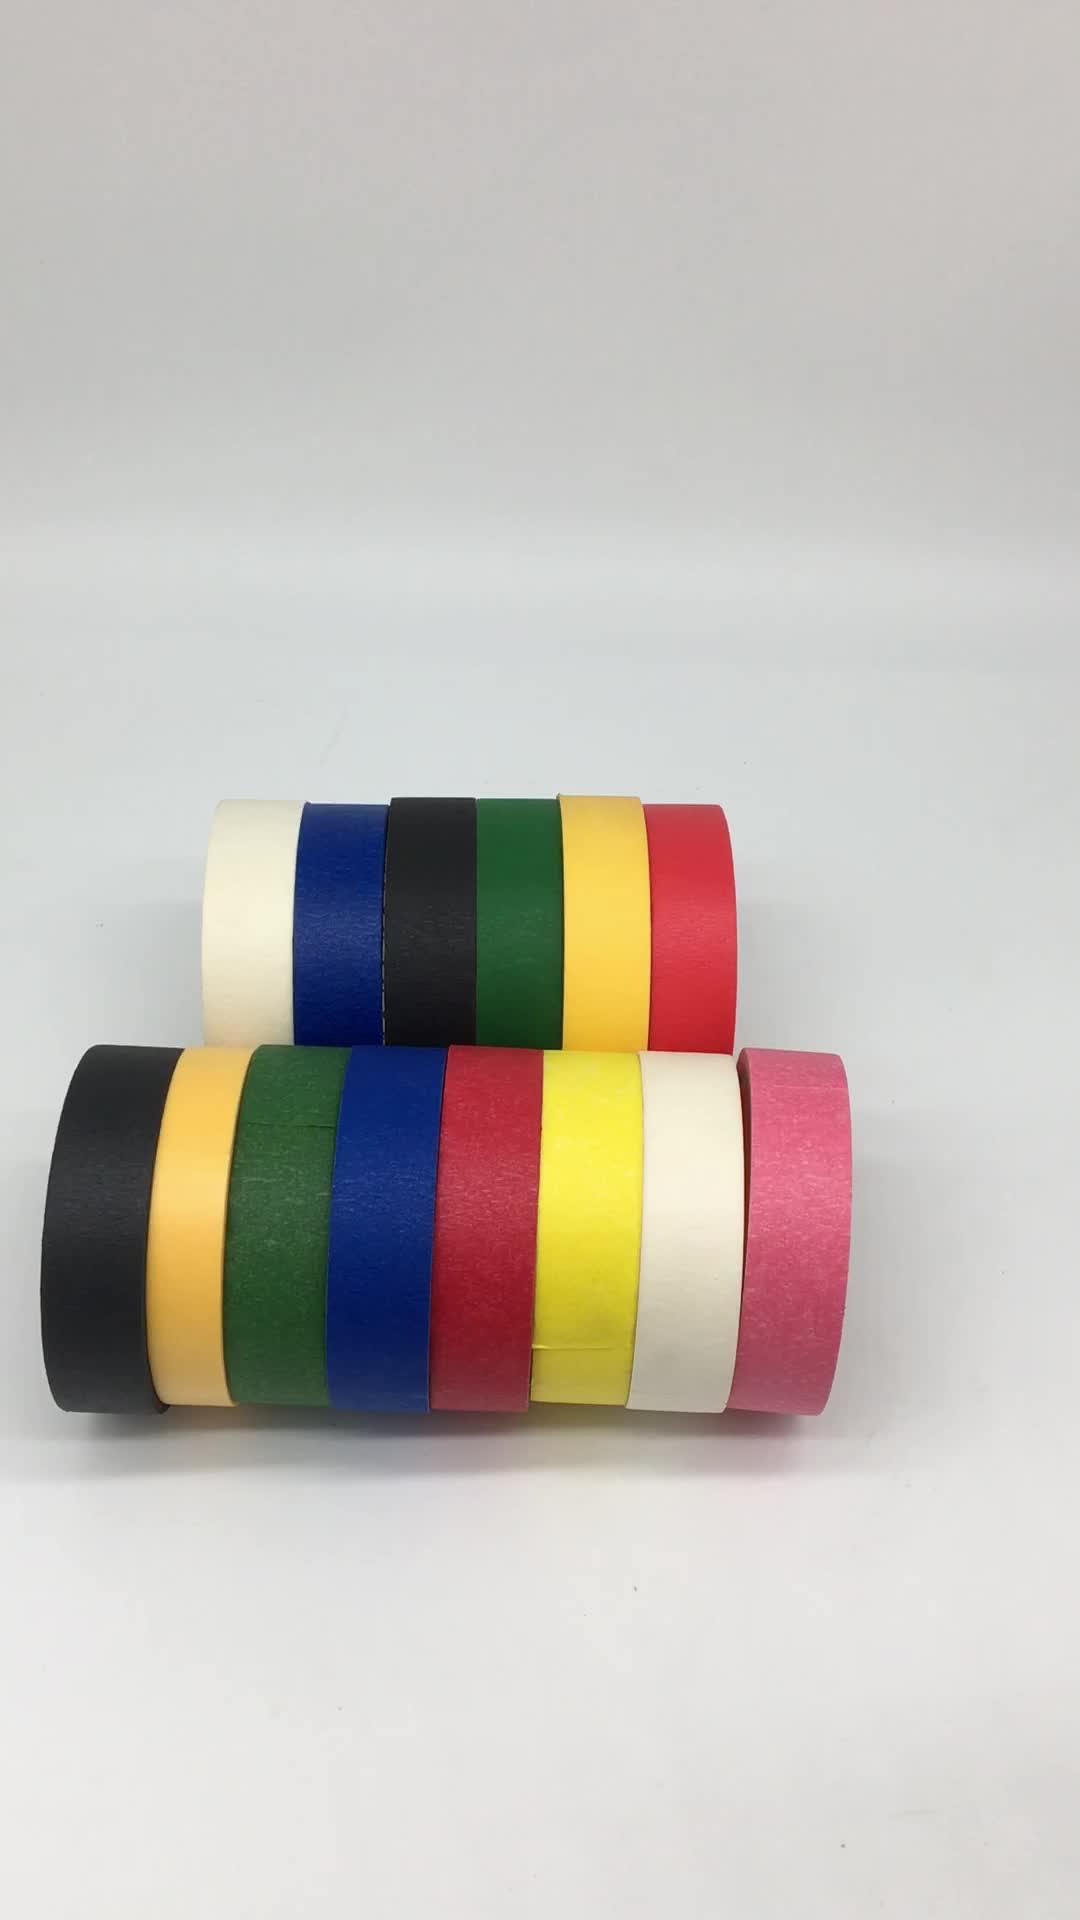 China fábrica con 13 experiencia suministrar diversos colores cinta adhesiva